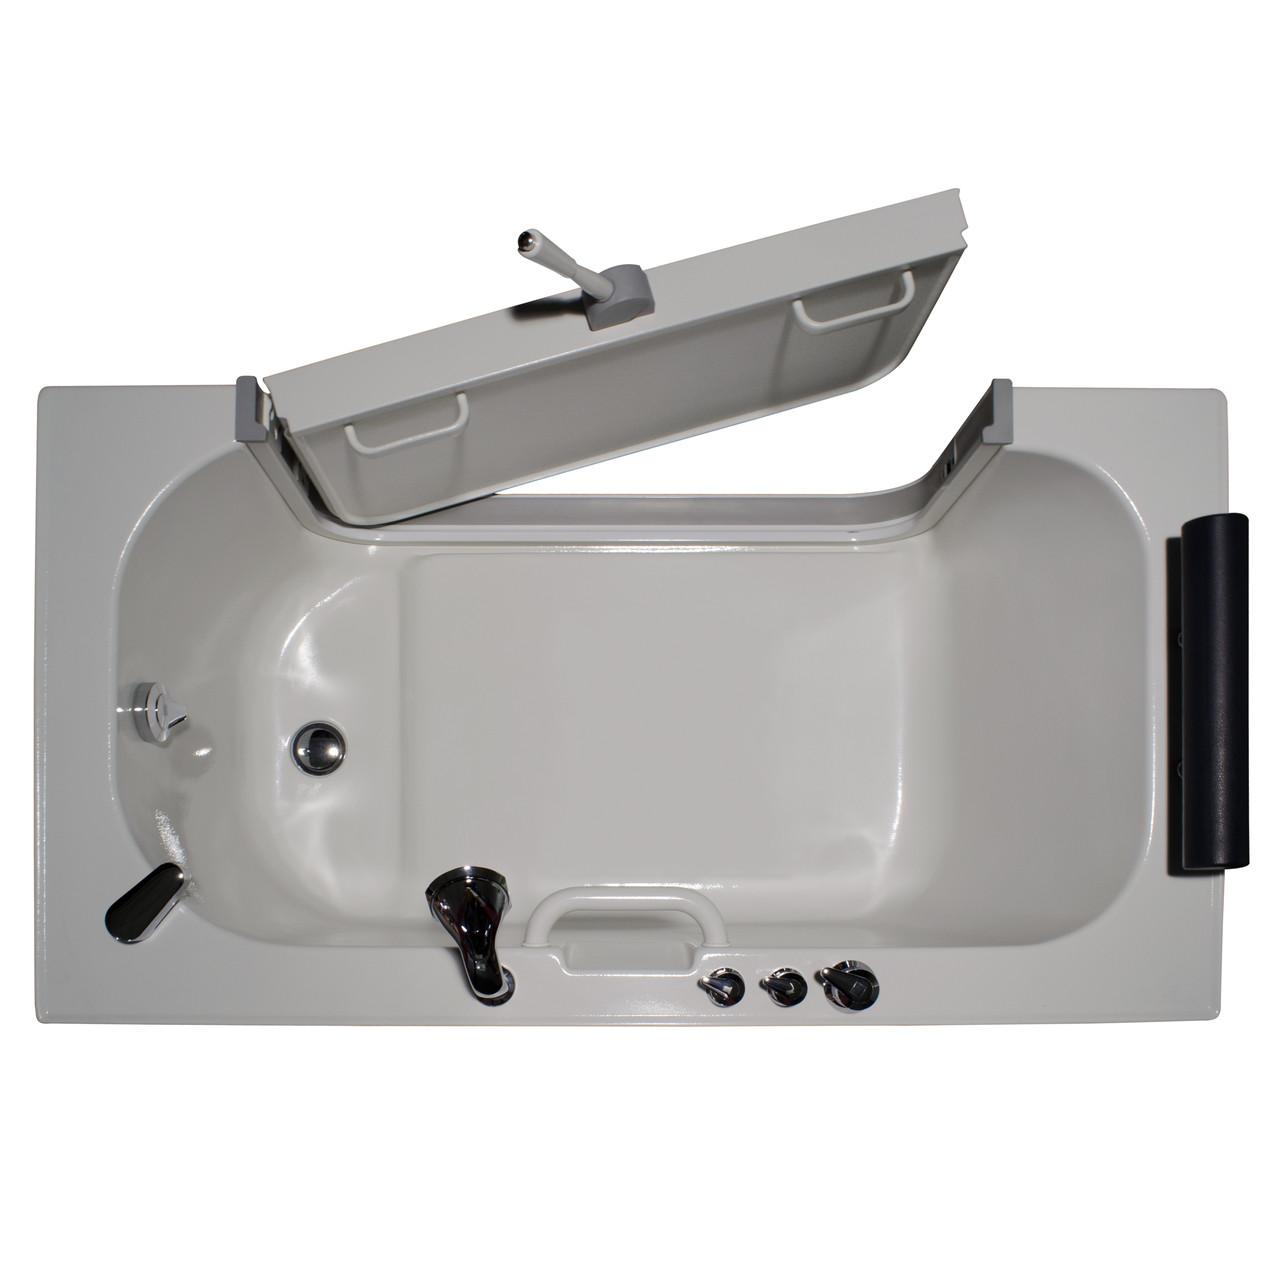 Homeward Bath Soaking SitIn Tub 3ft Wide Outward Opening Door 59x32 Neptune Series HY1342